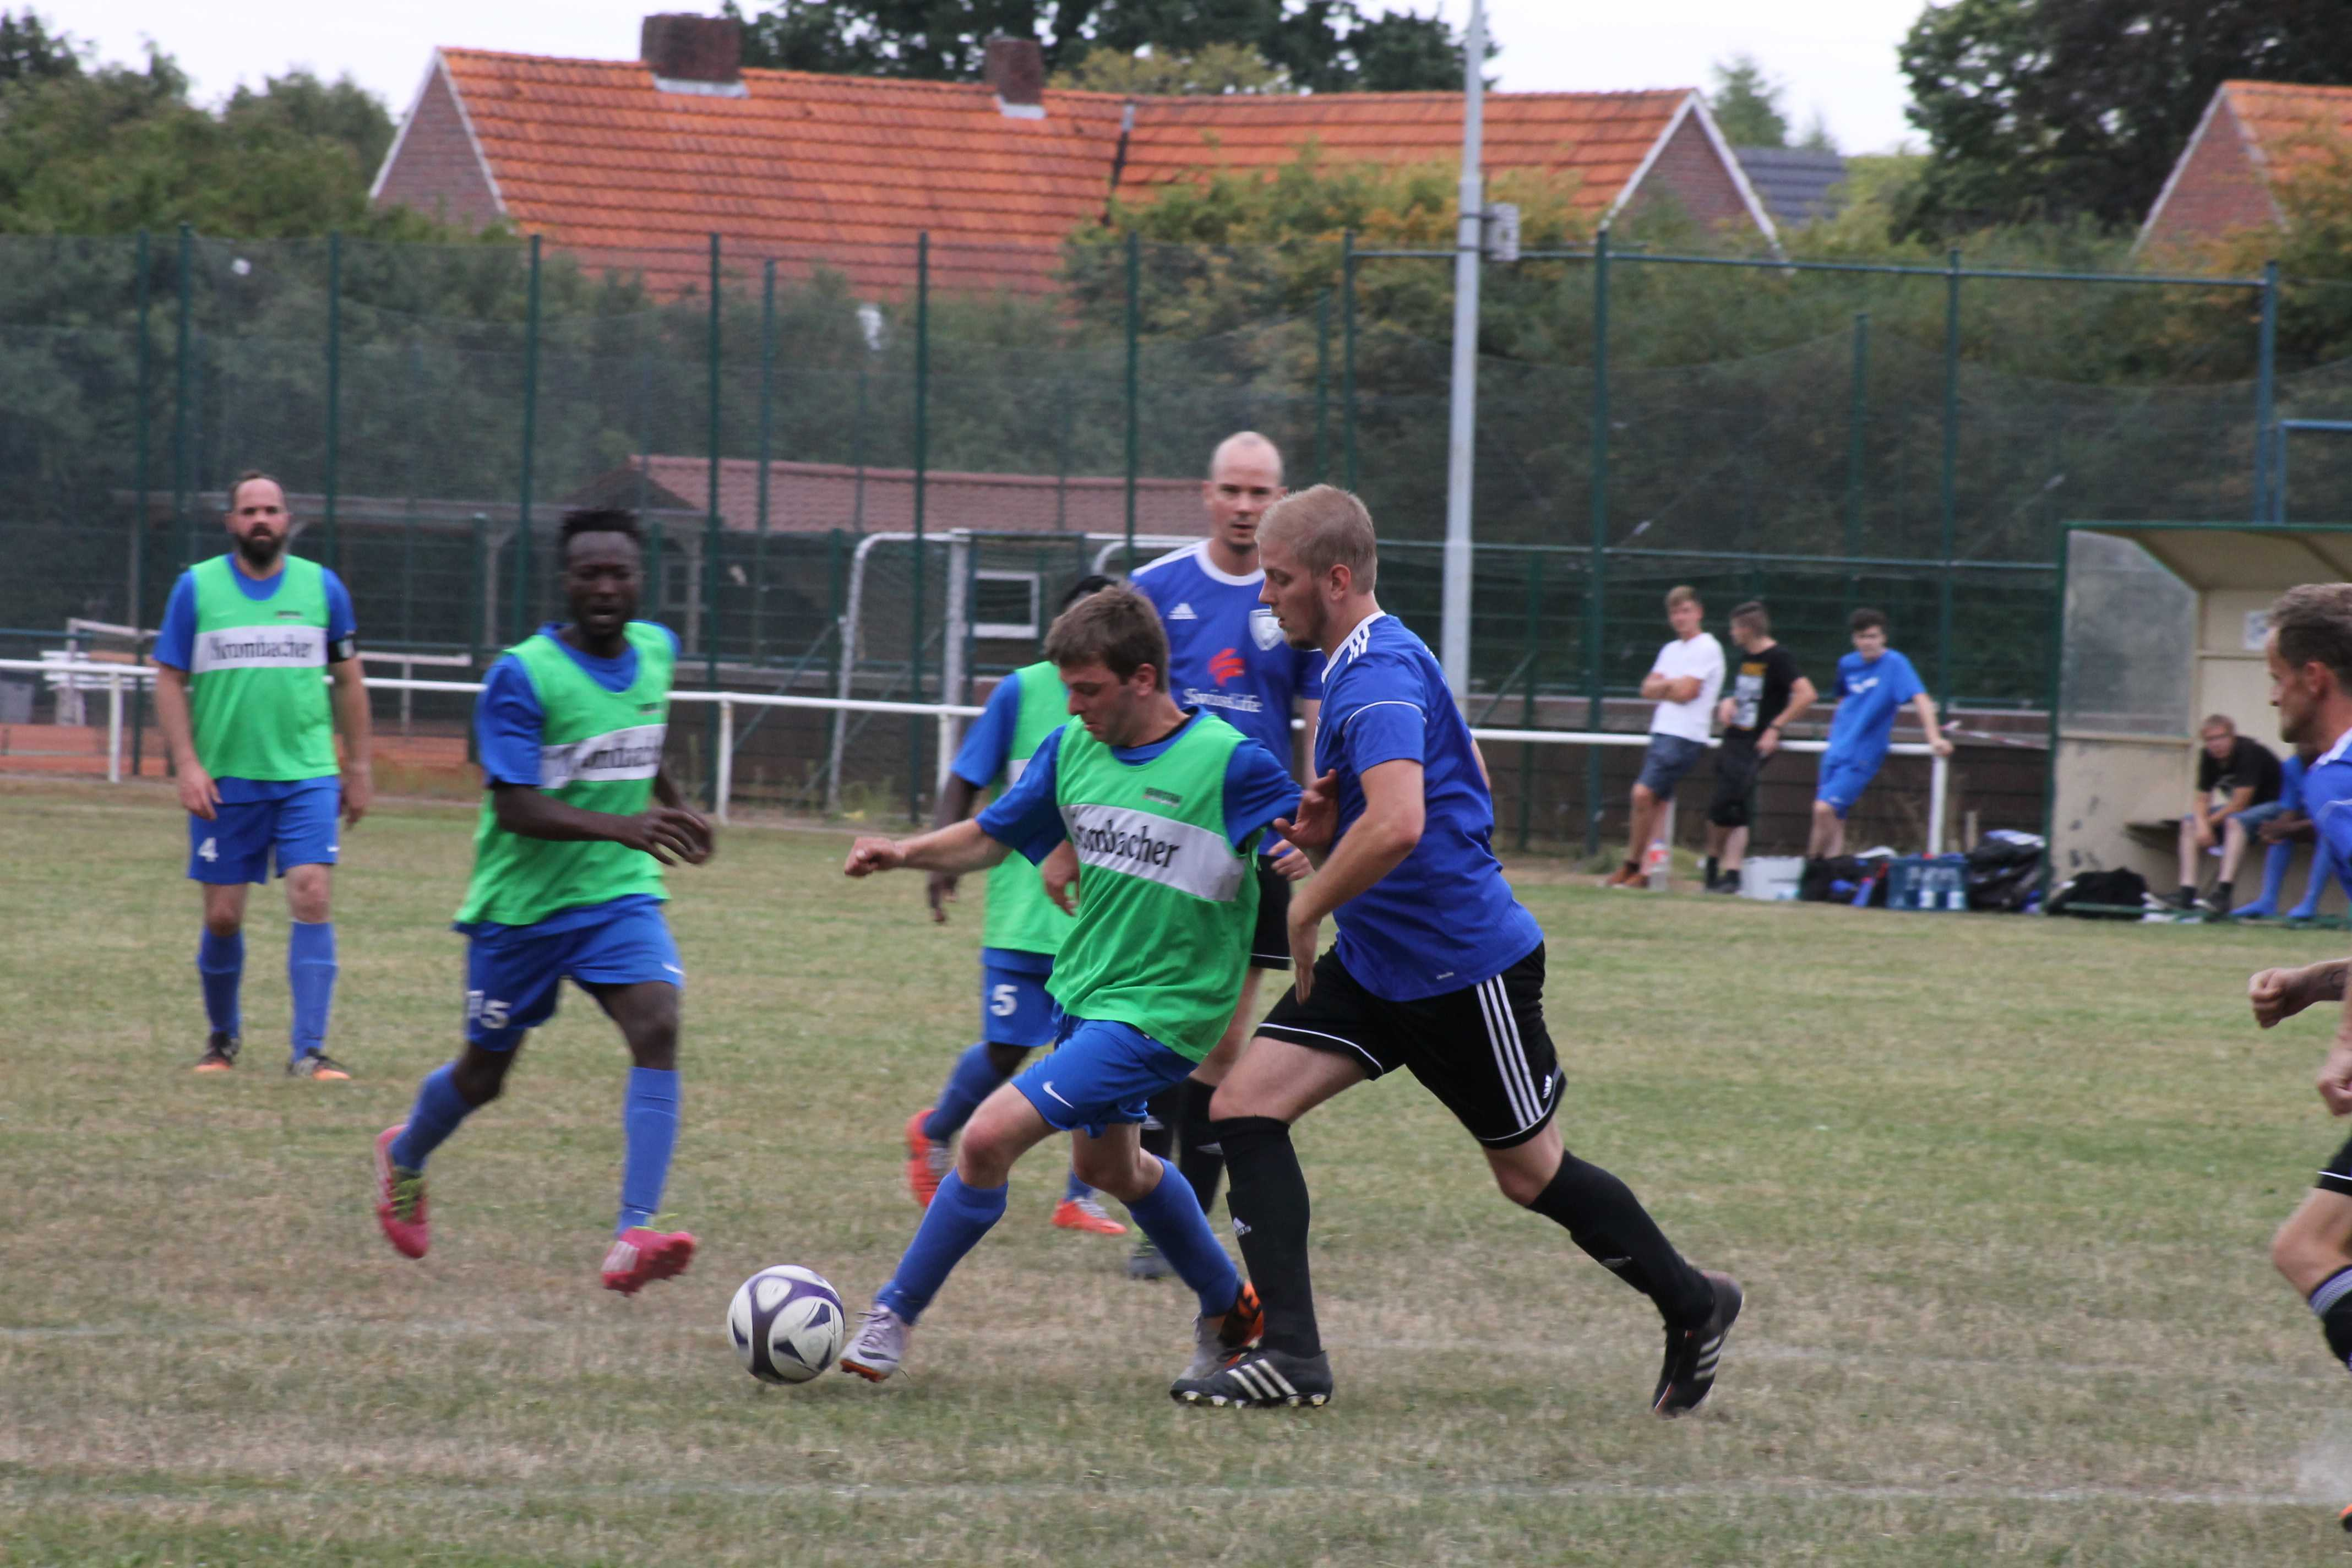 2018-07-29 Sportwoche - Sportpicknick & Football & Fußball (108)